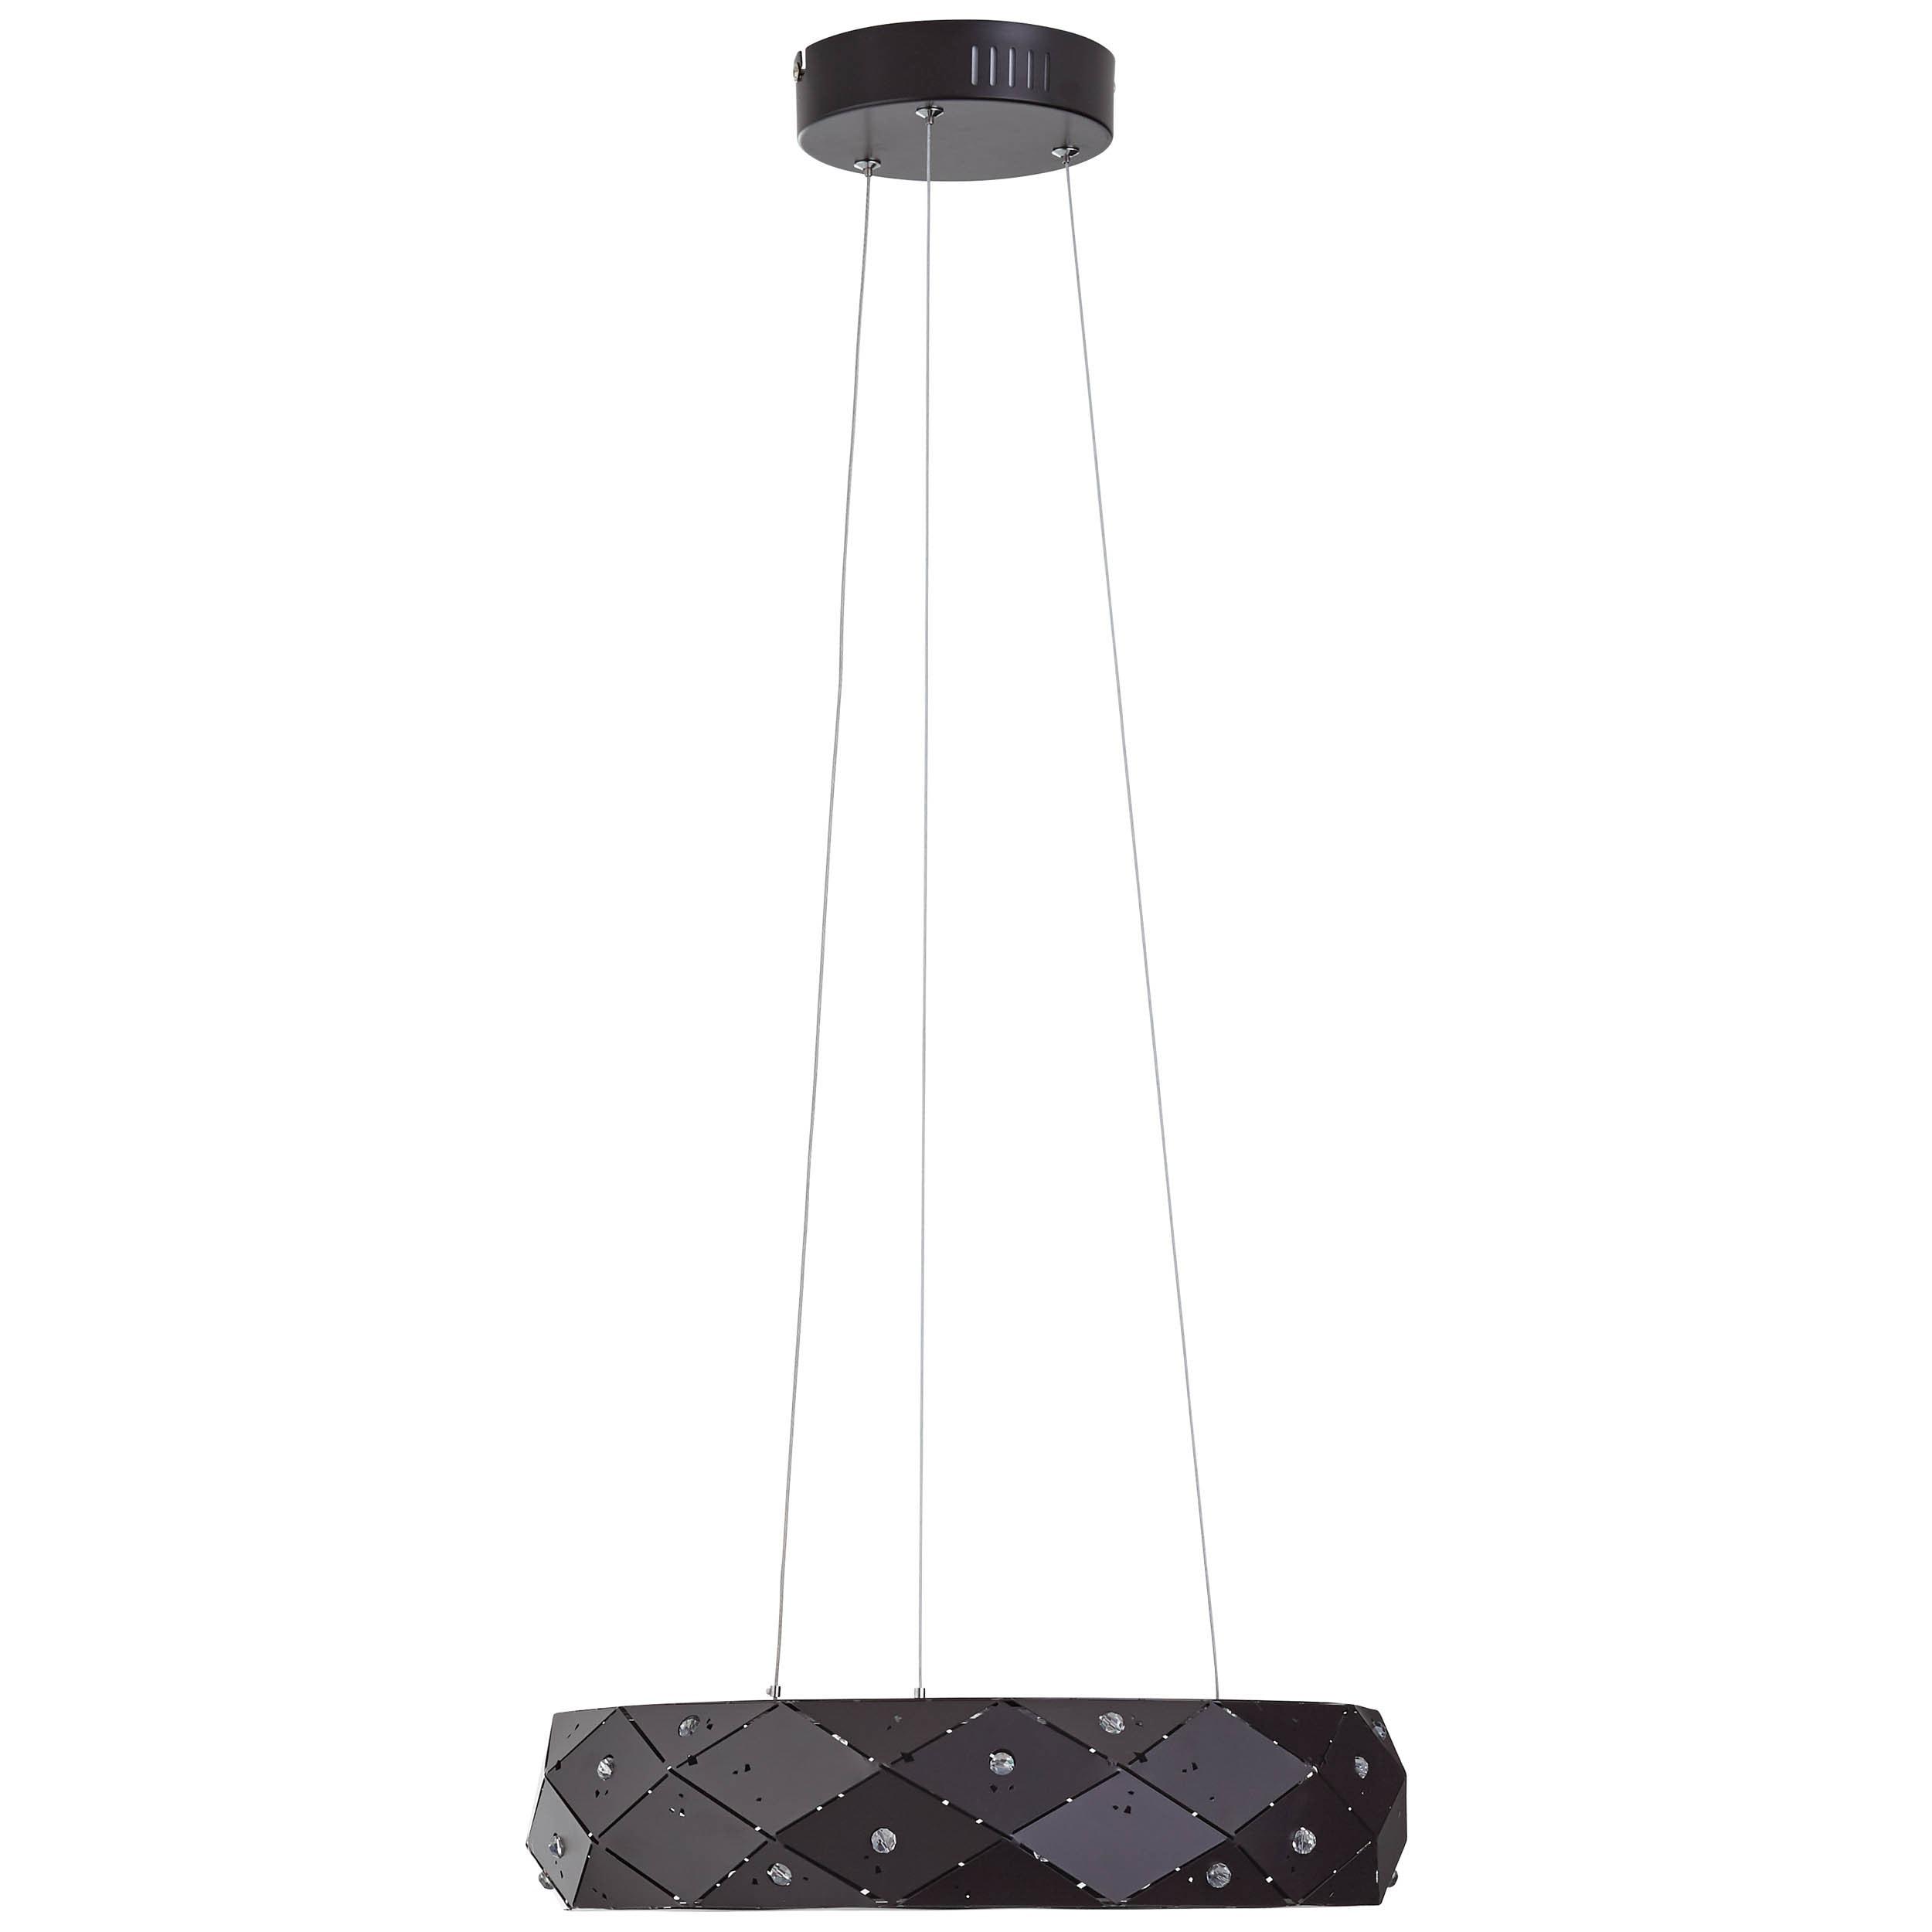 Brilliant Leuchten Fona LED Pendelleuchte 45cm braun/Kaffee